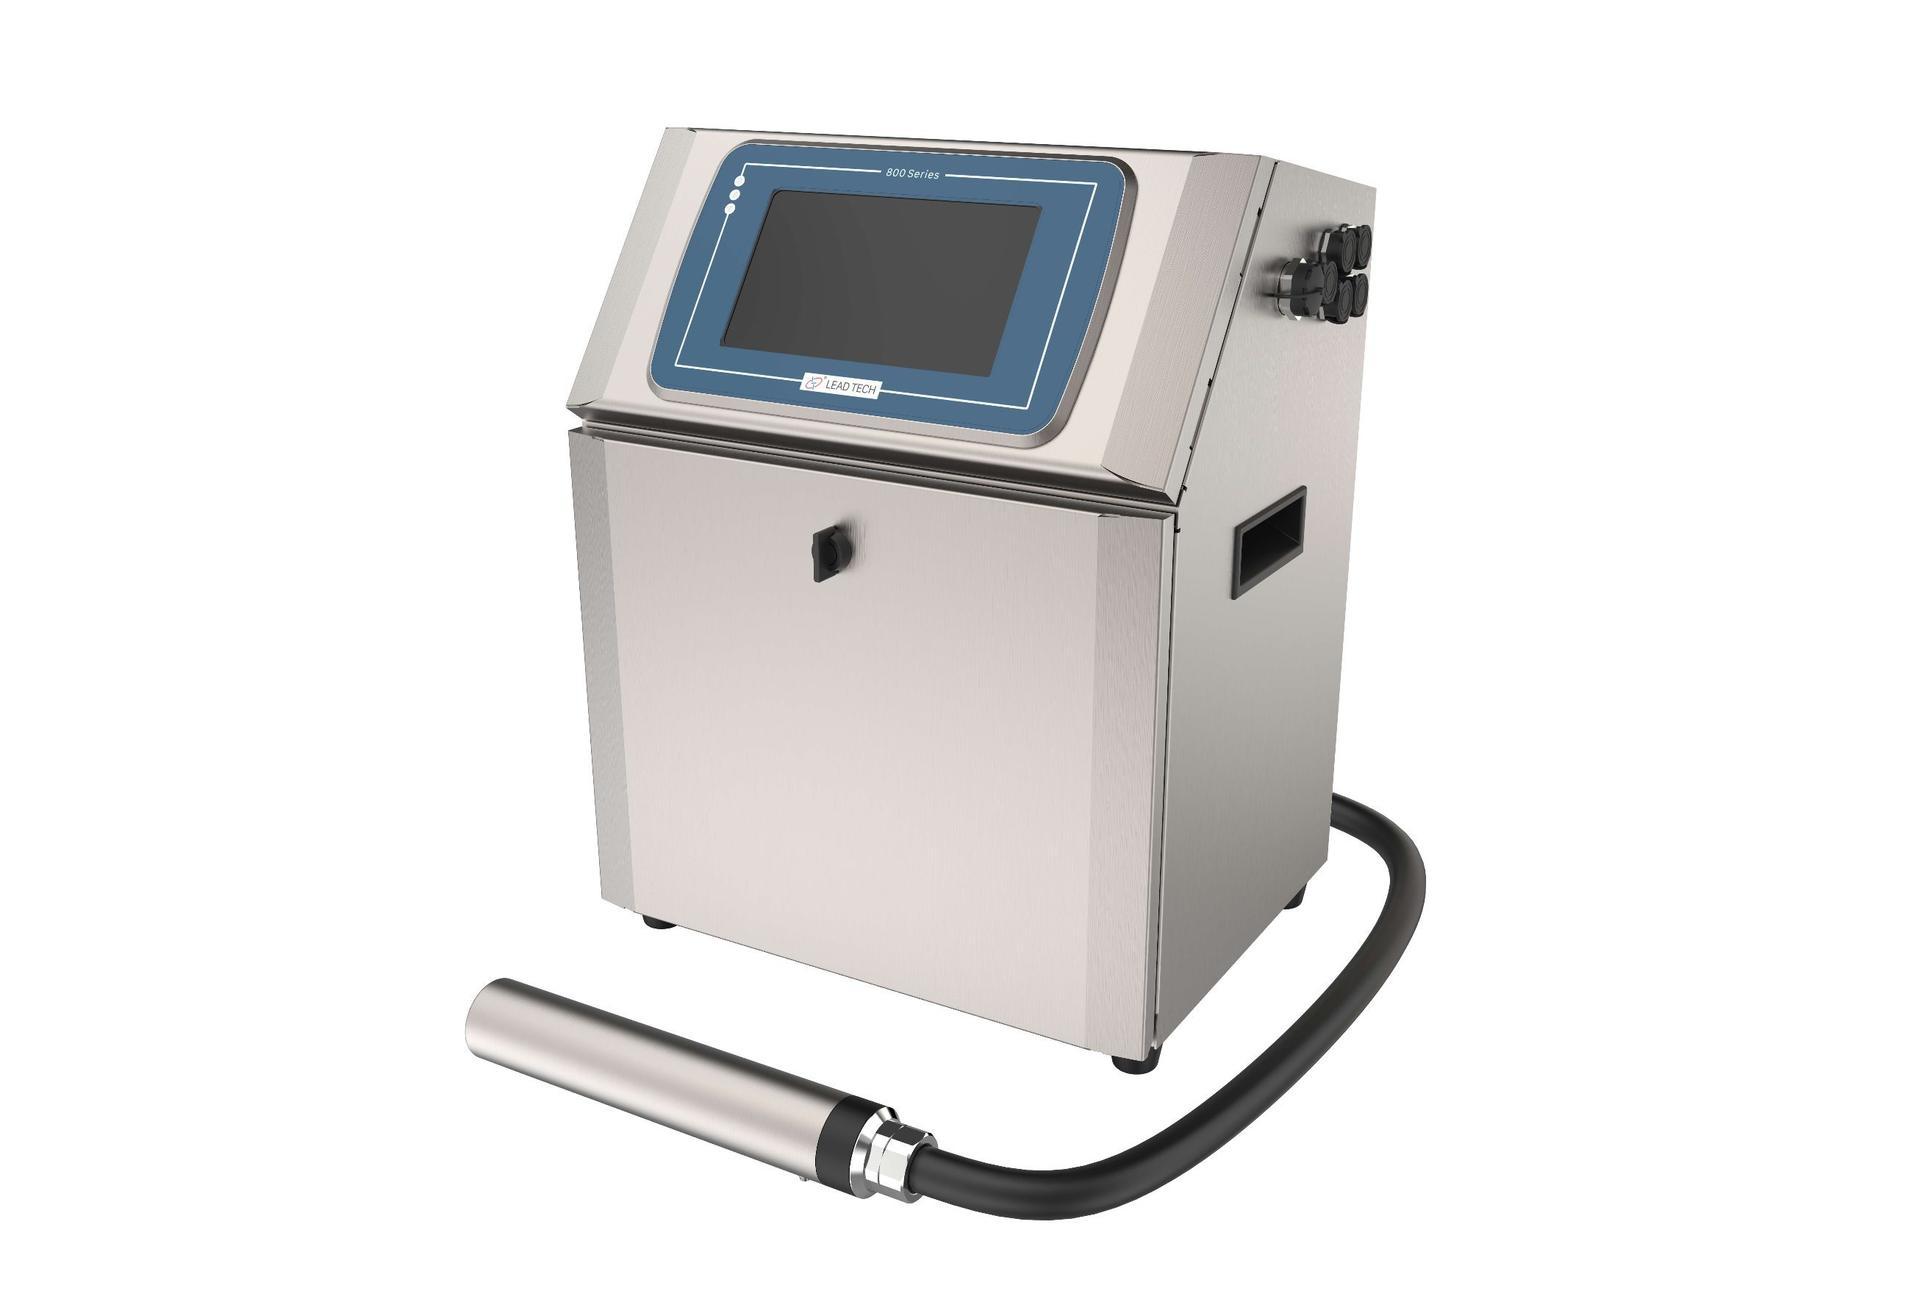 Lt800 Barcode Printing Machine Cij Inkjet Printer